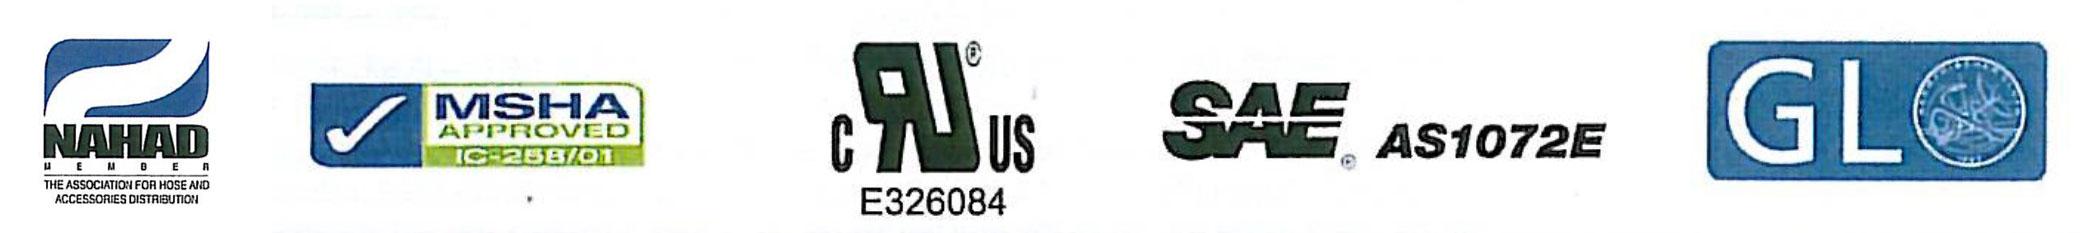 ADL PyroJacket Certification